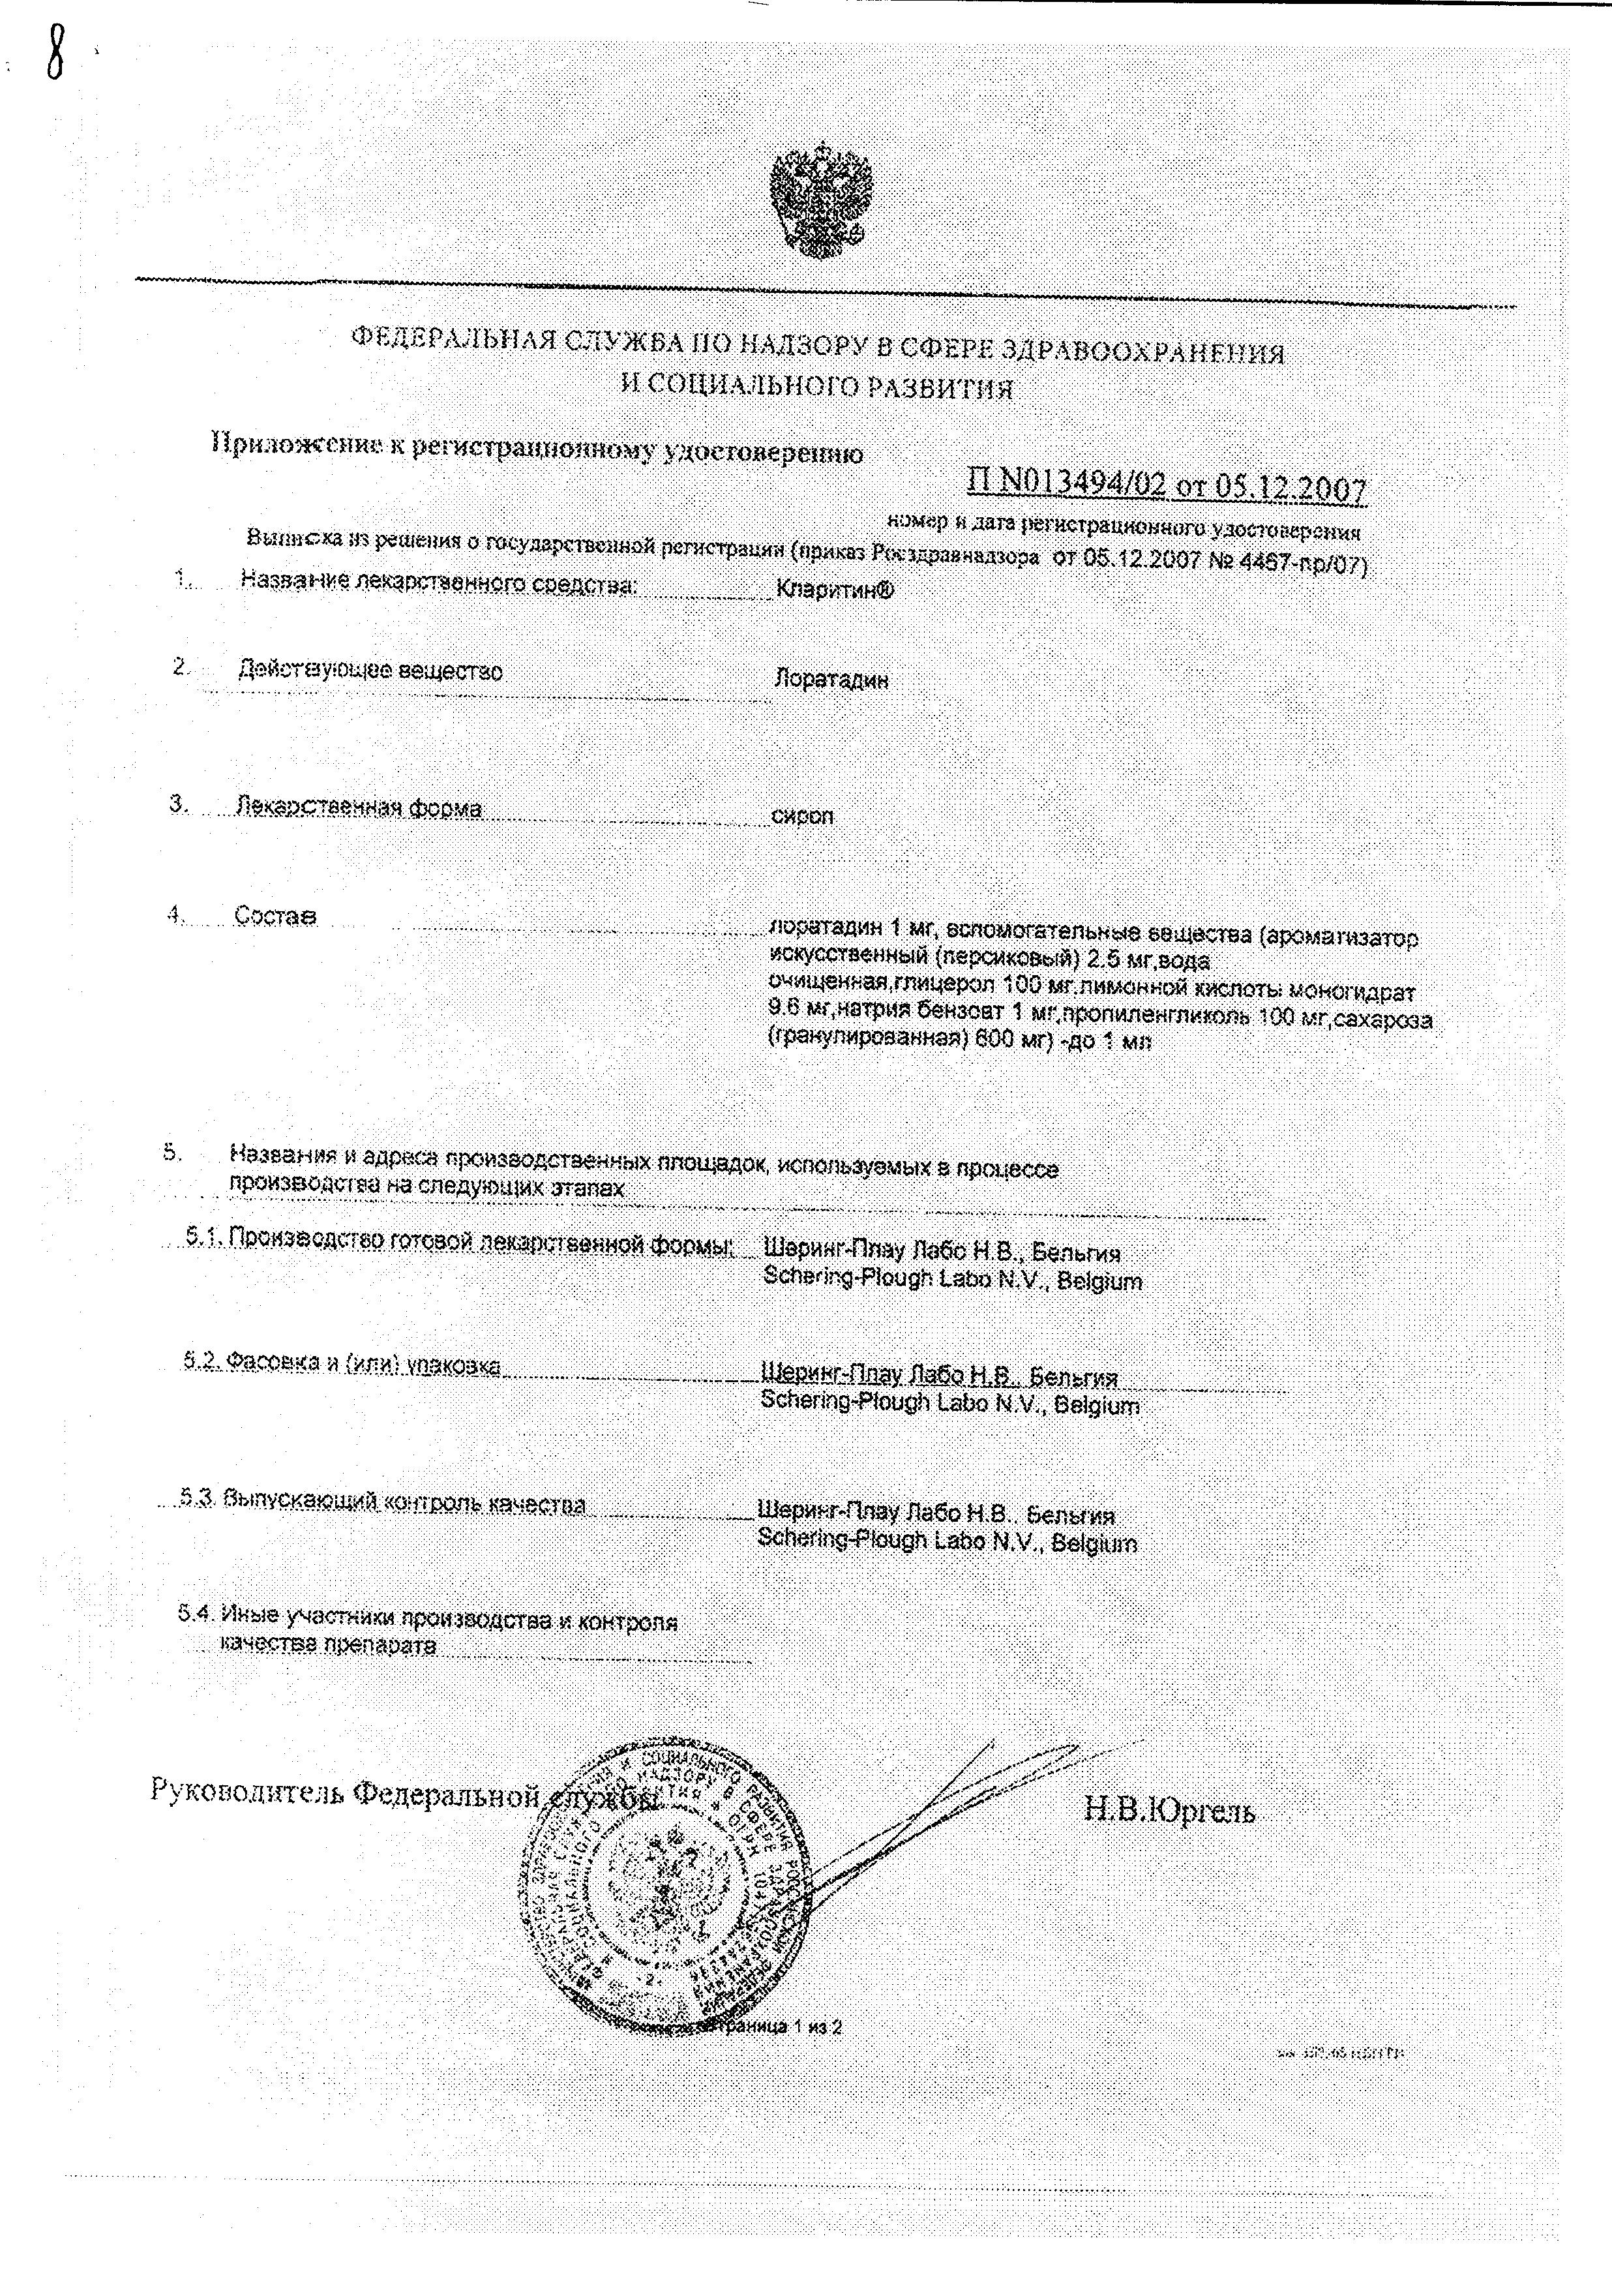 Кларитин сертификат